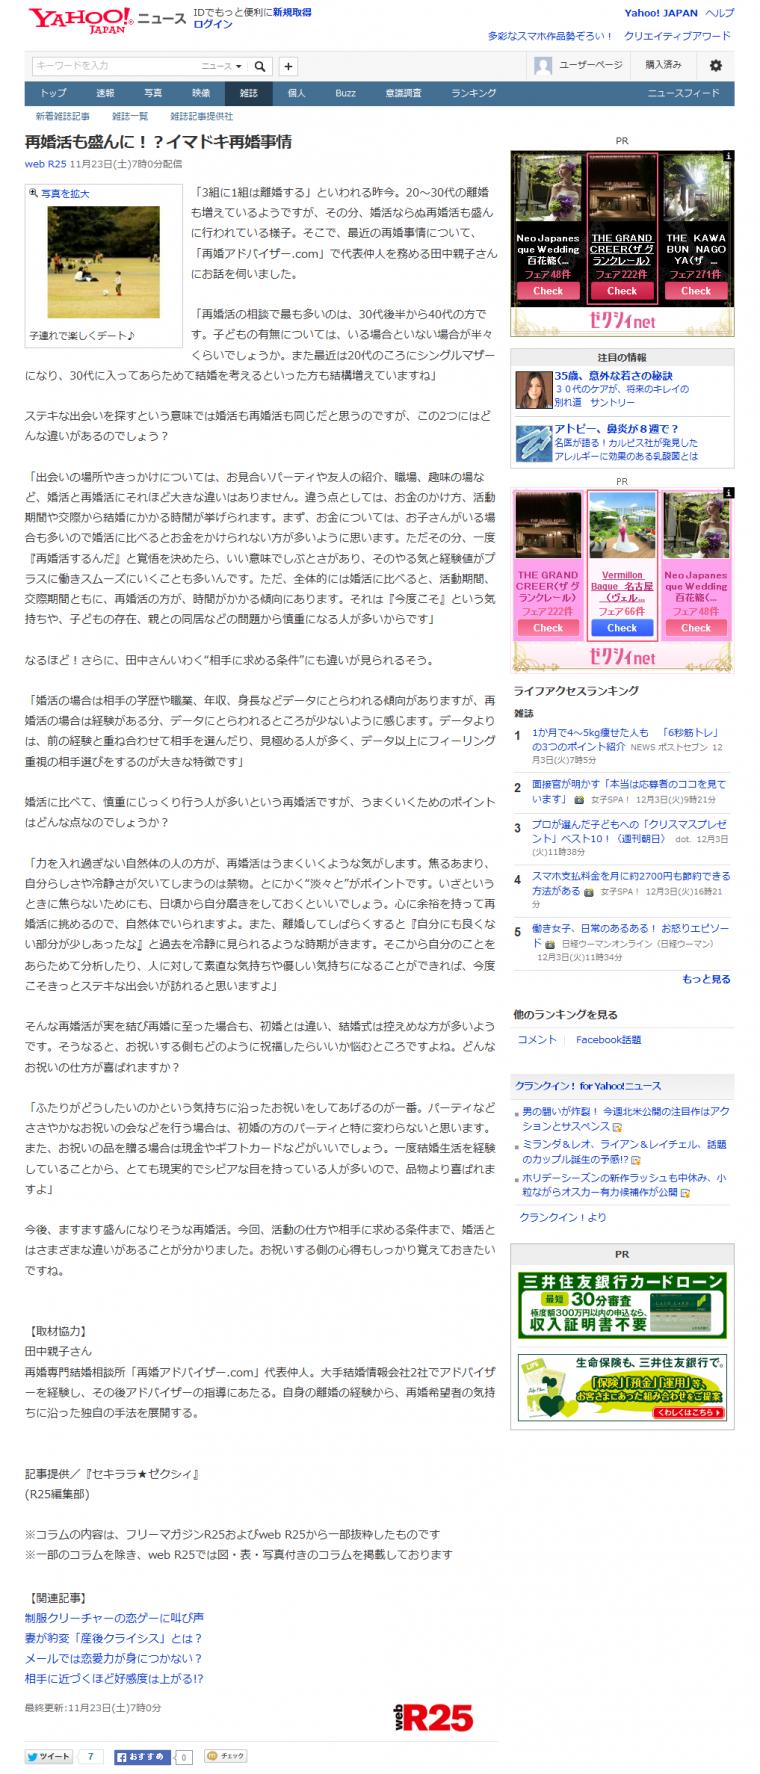 media-yahoo01